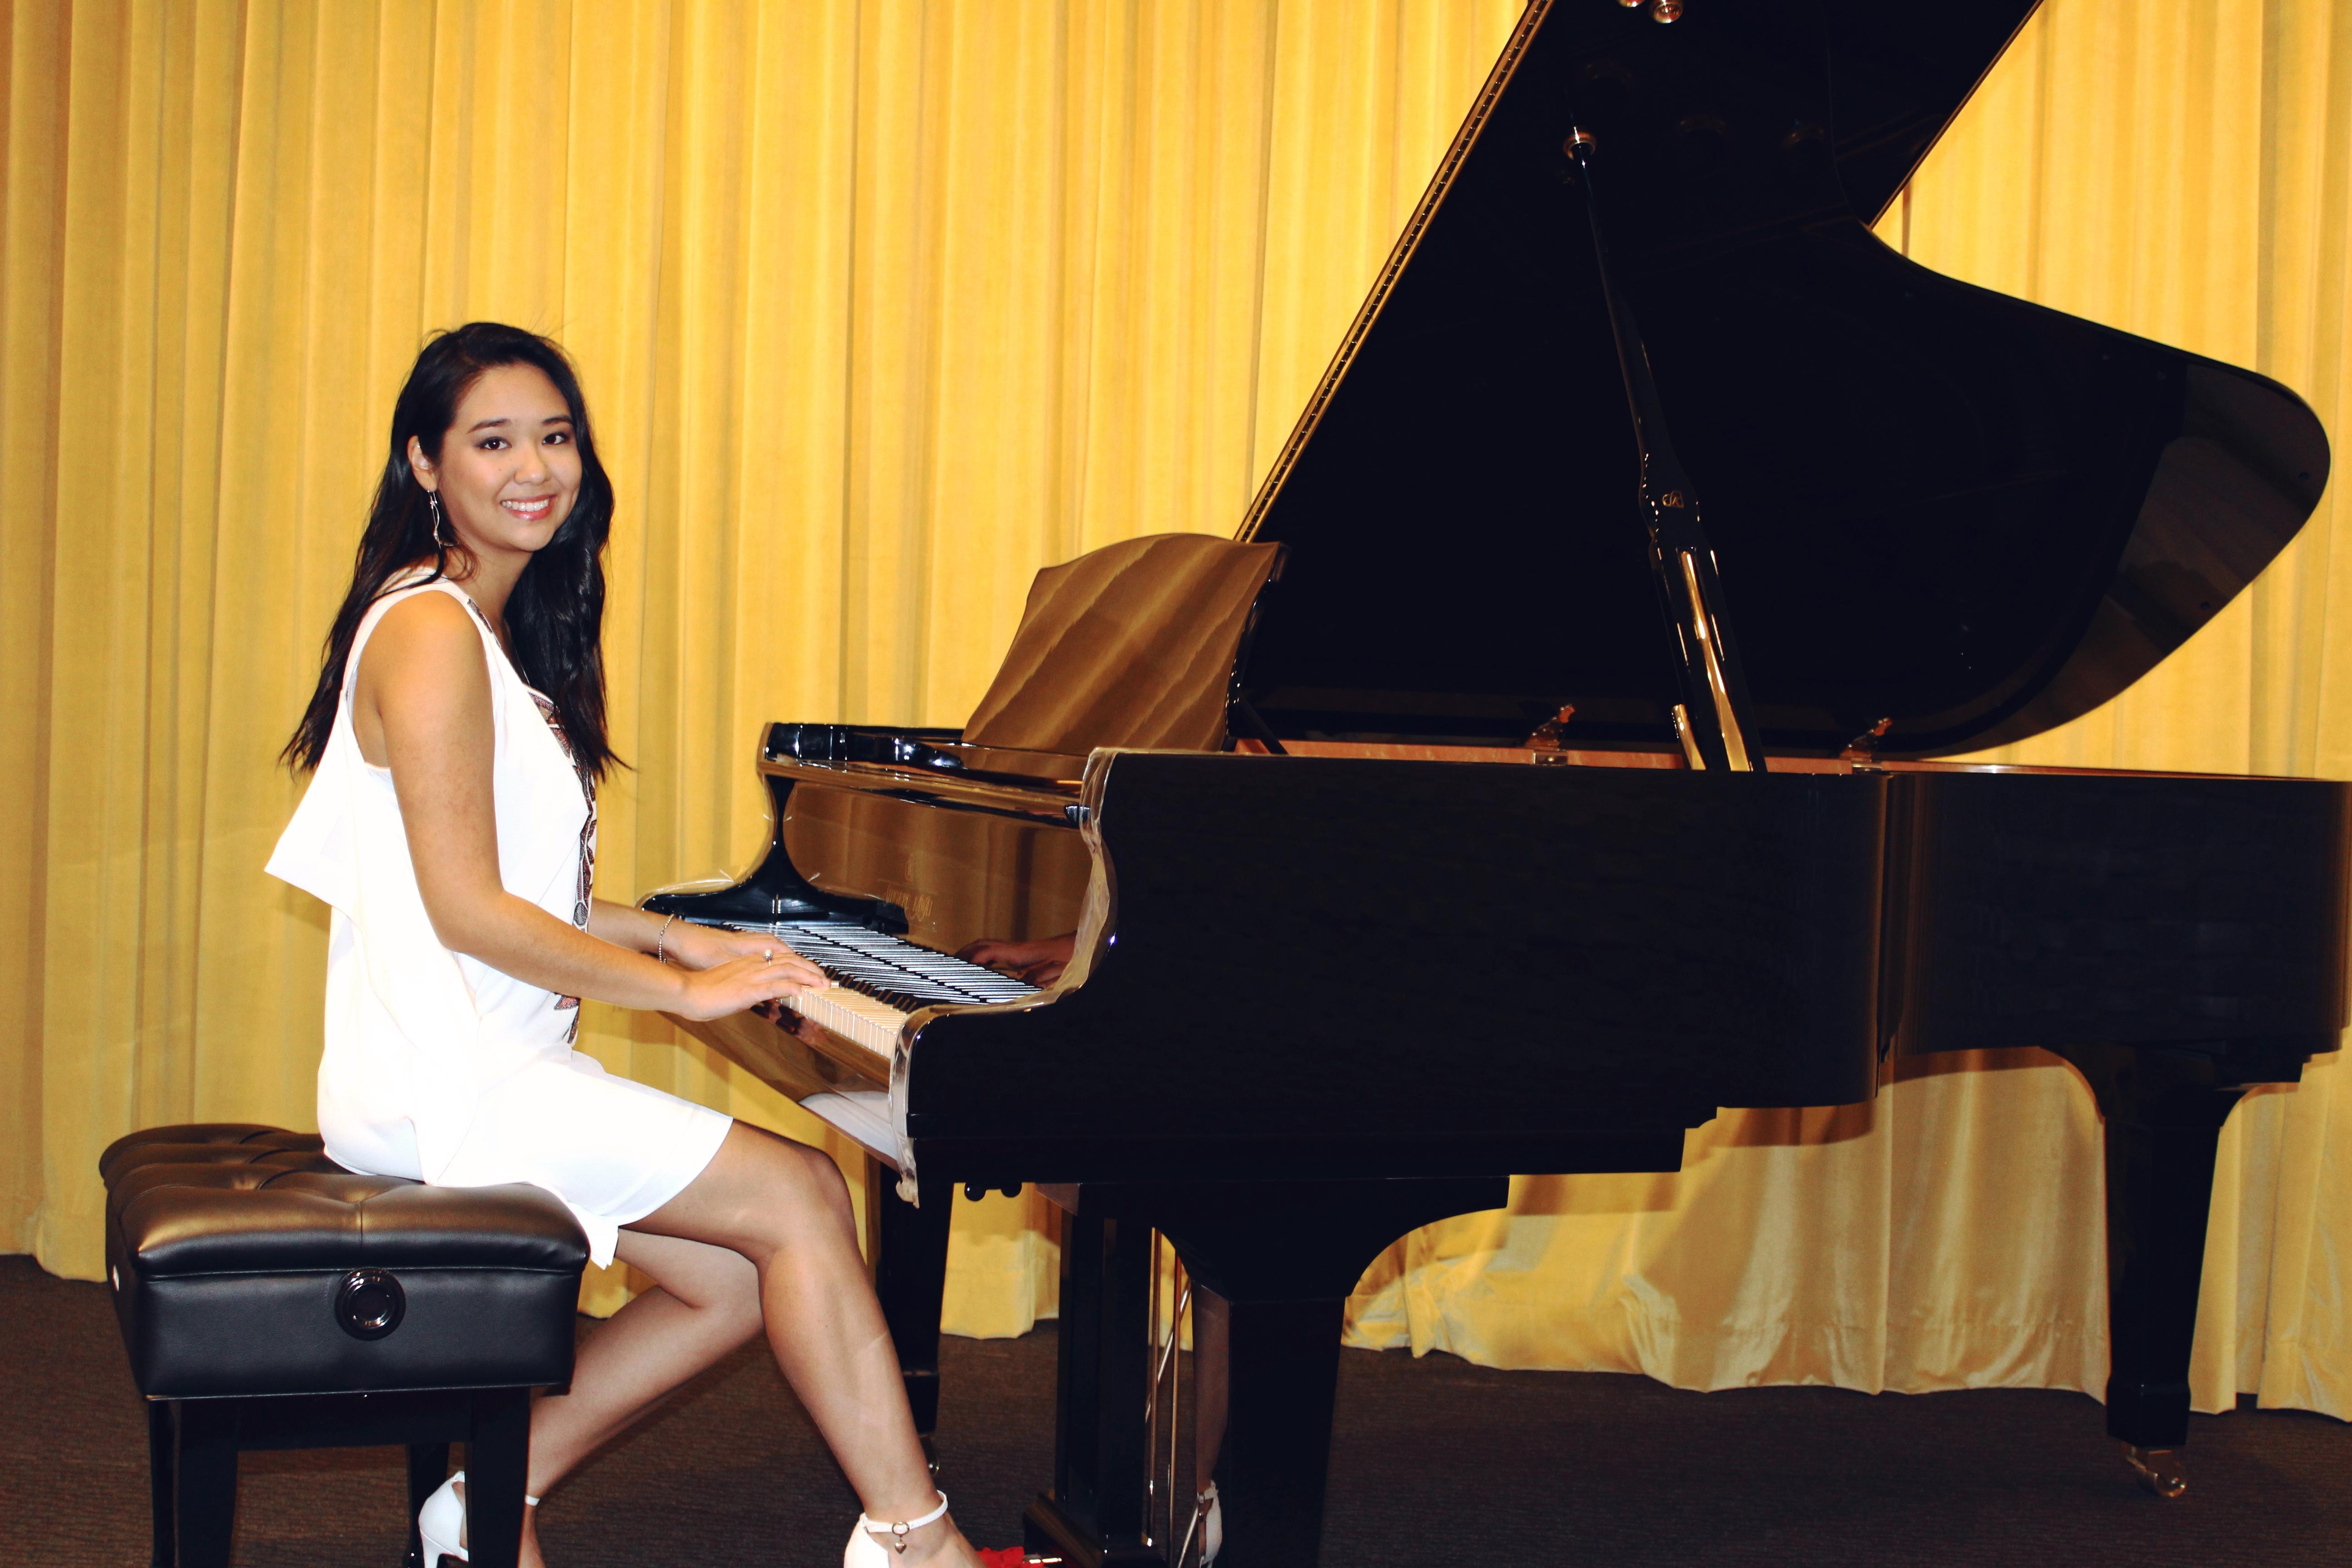 Jess piano